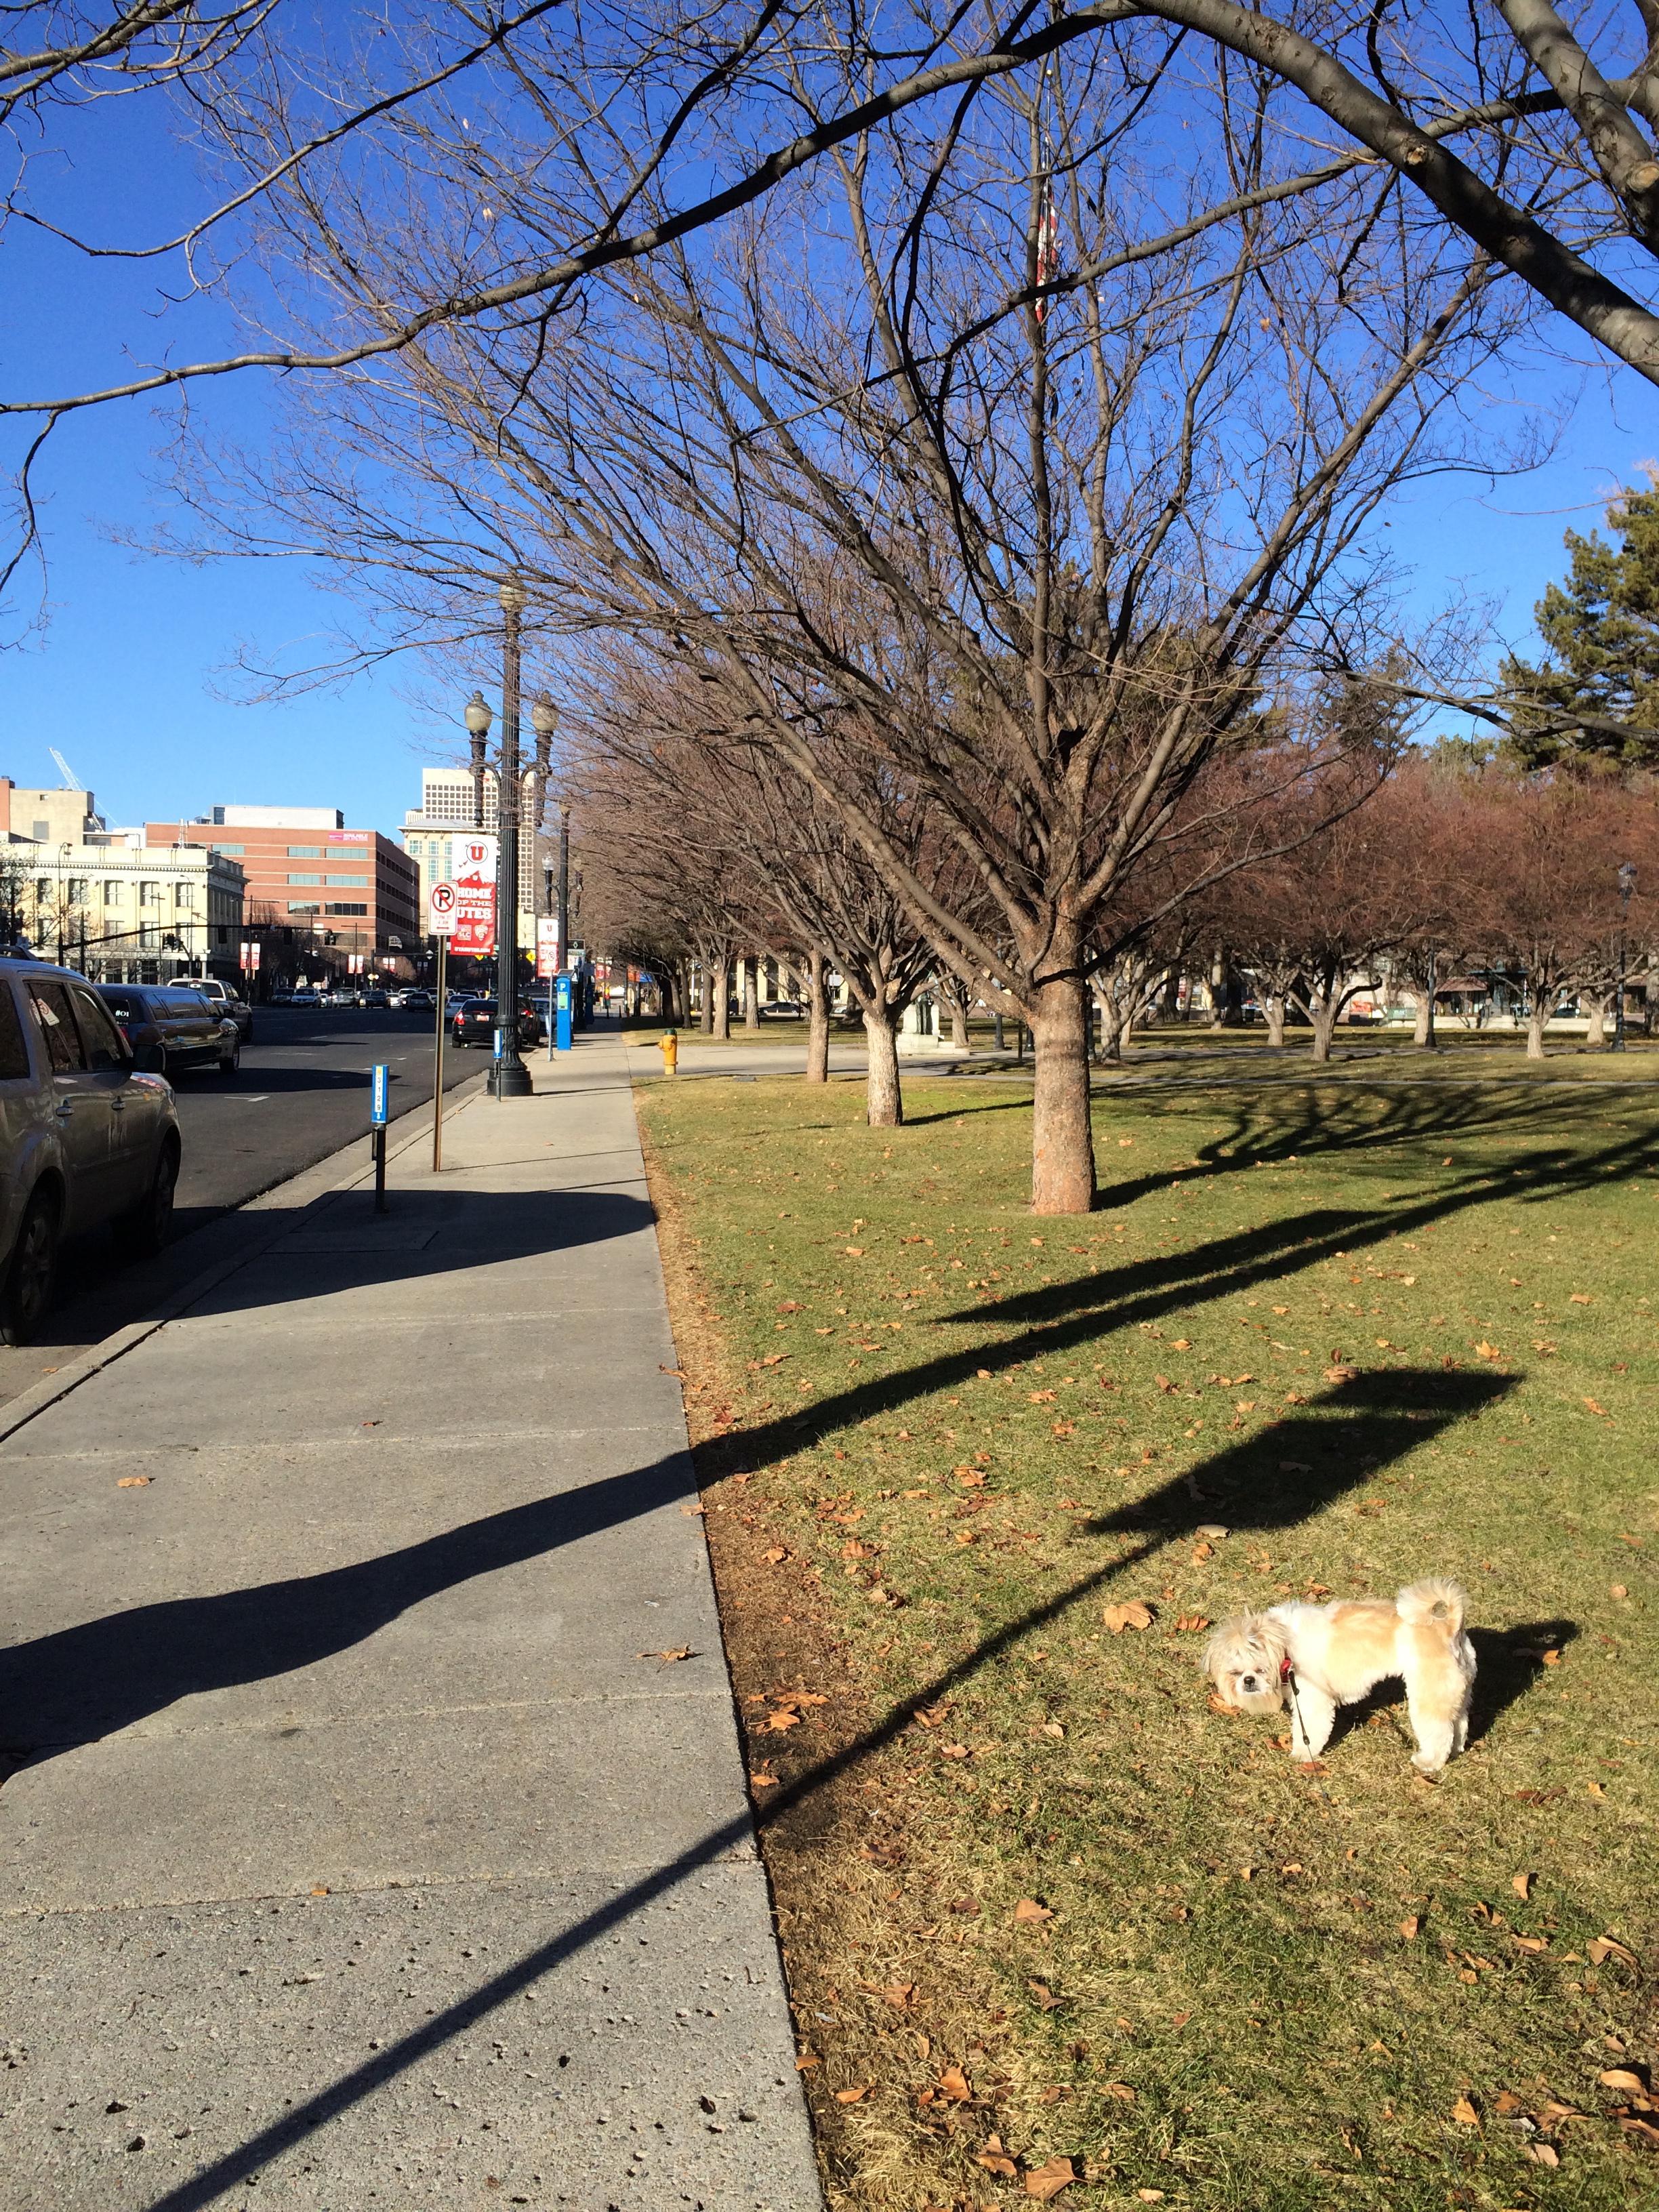 Saturday Summer in January 17, 2015 712